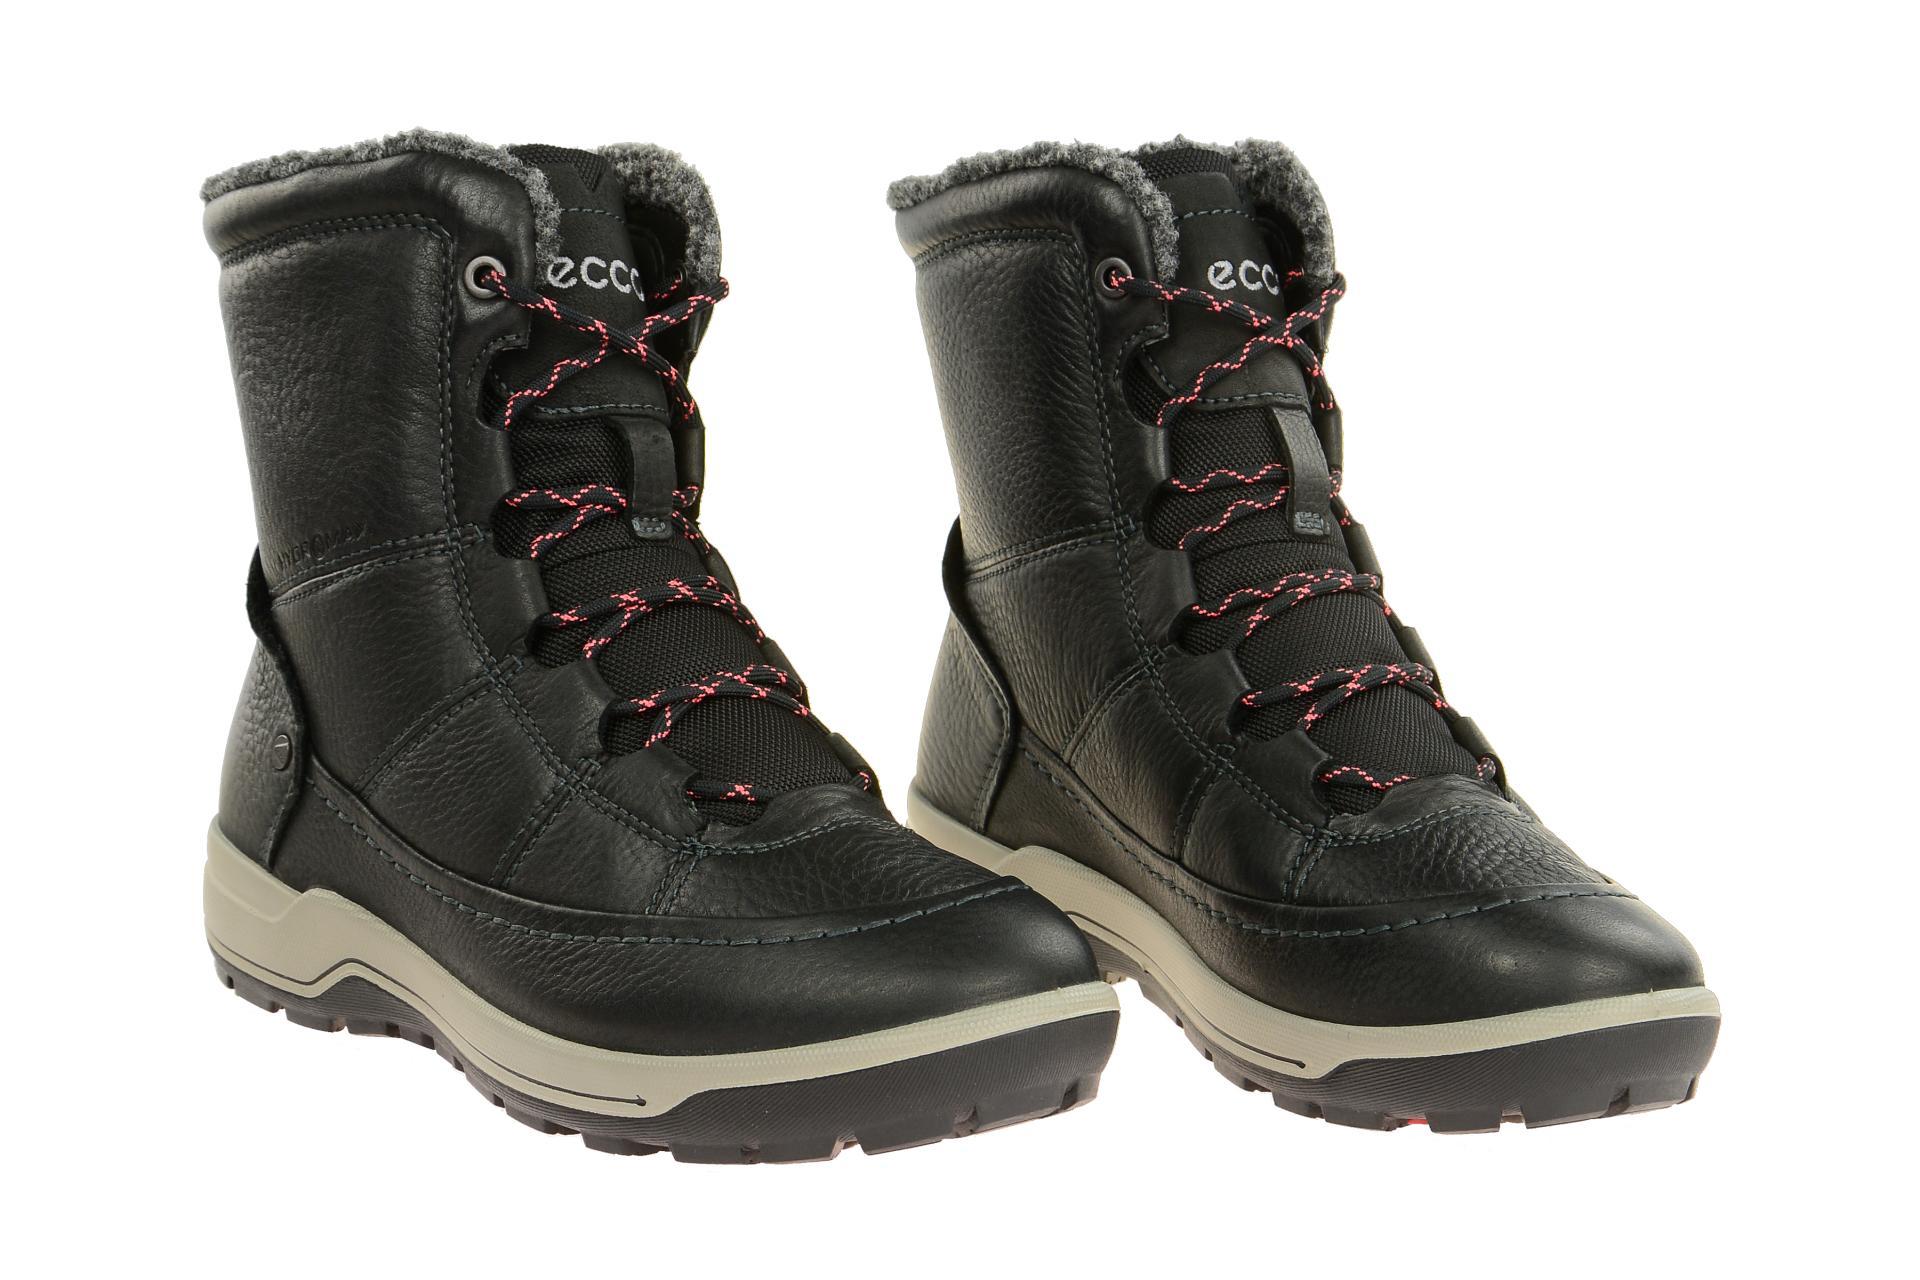 Ecco Schuhe TRACE LITE schwarz Damenstiefel Winterstiefel 83215302001 NEU | eBay